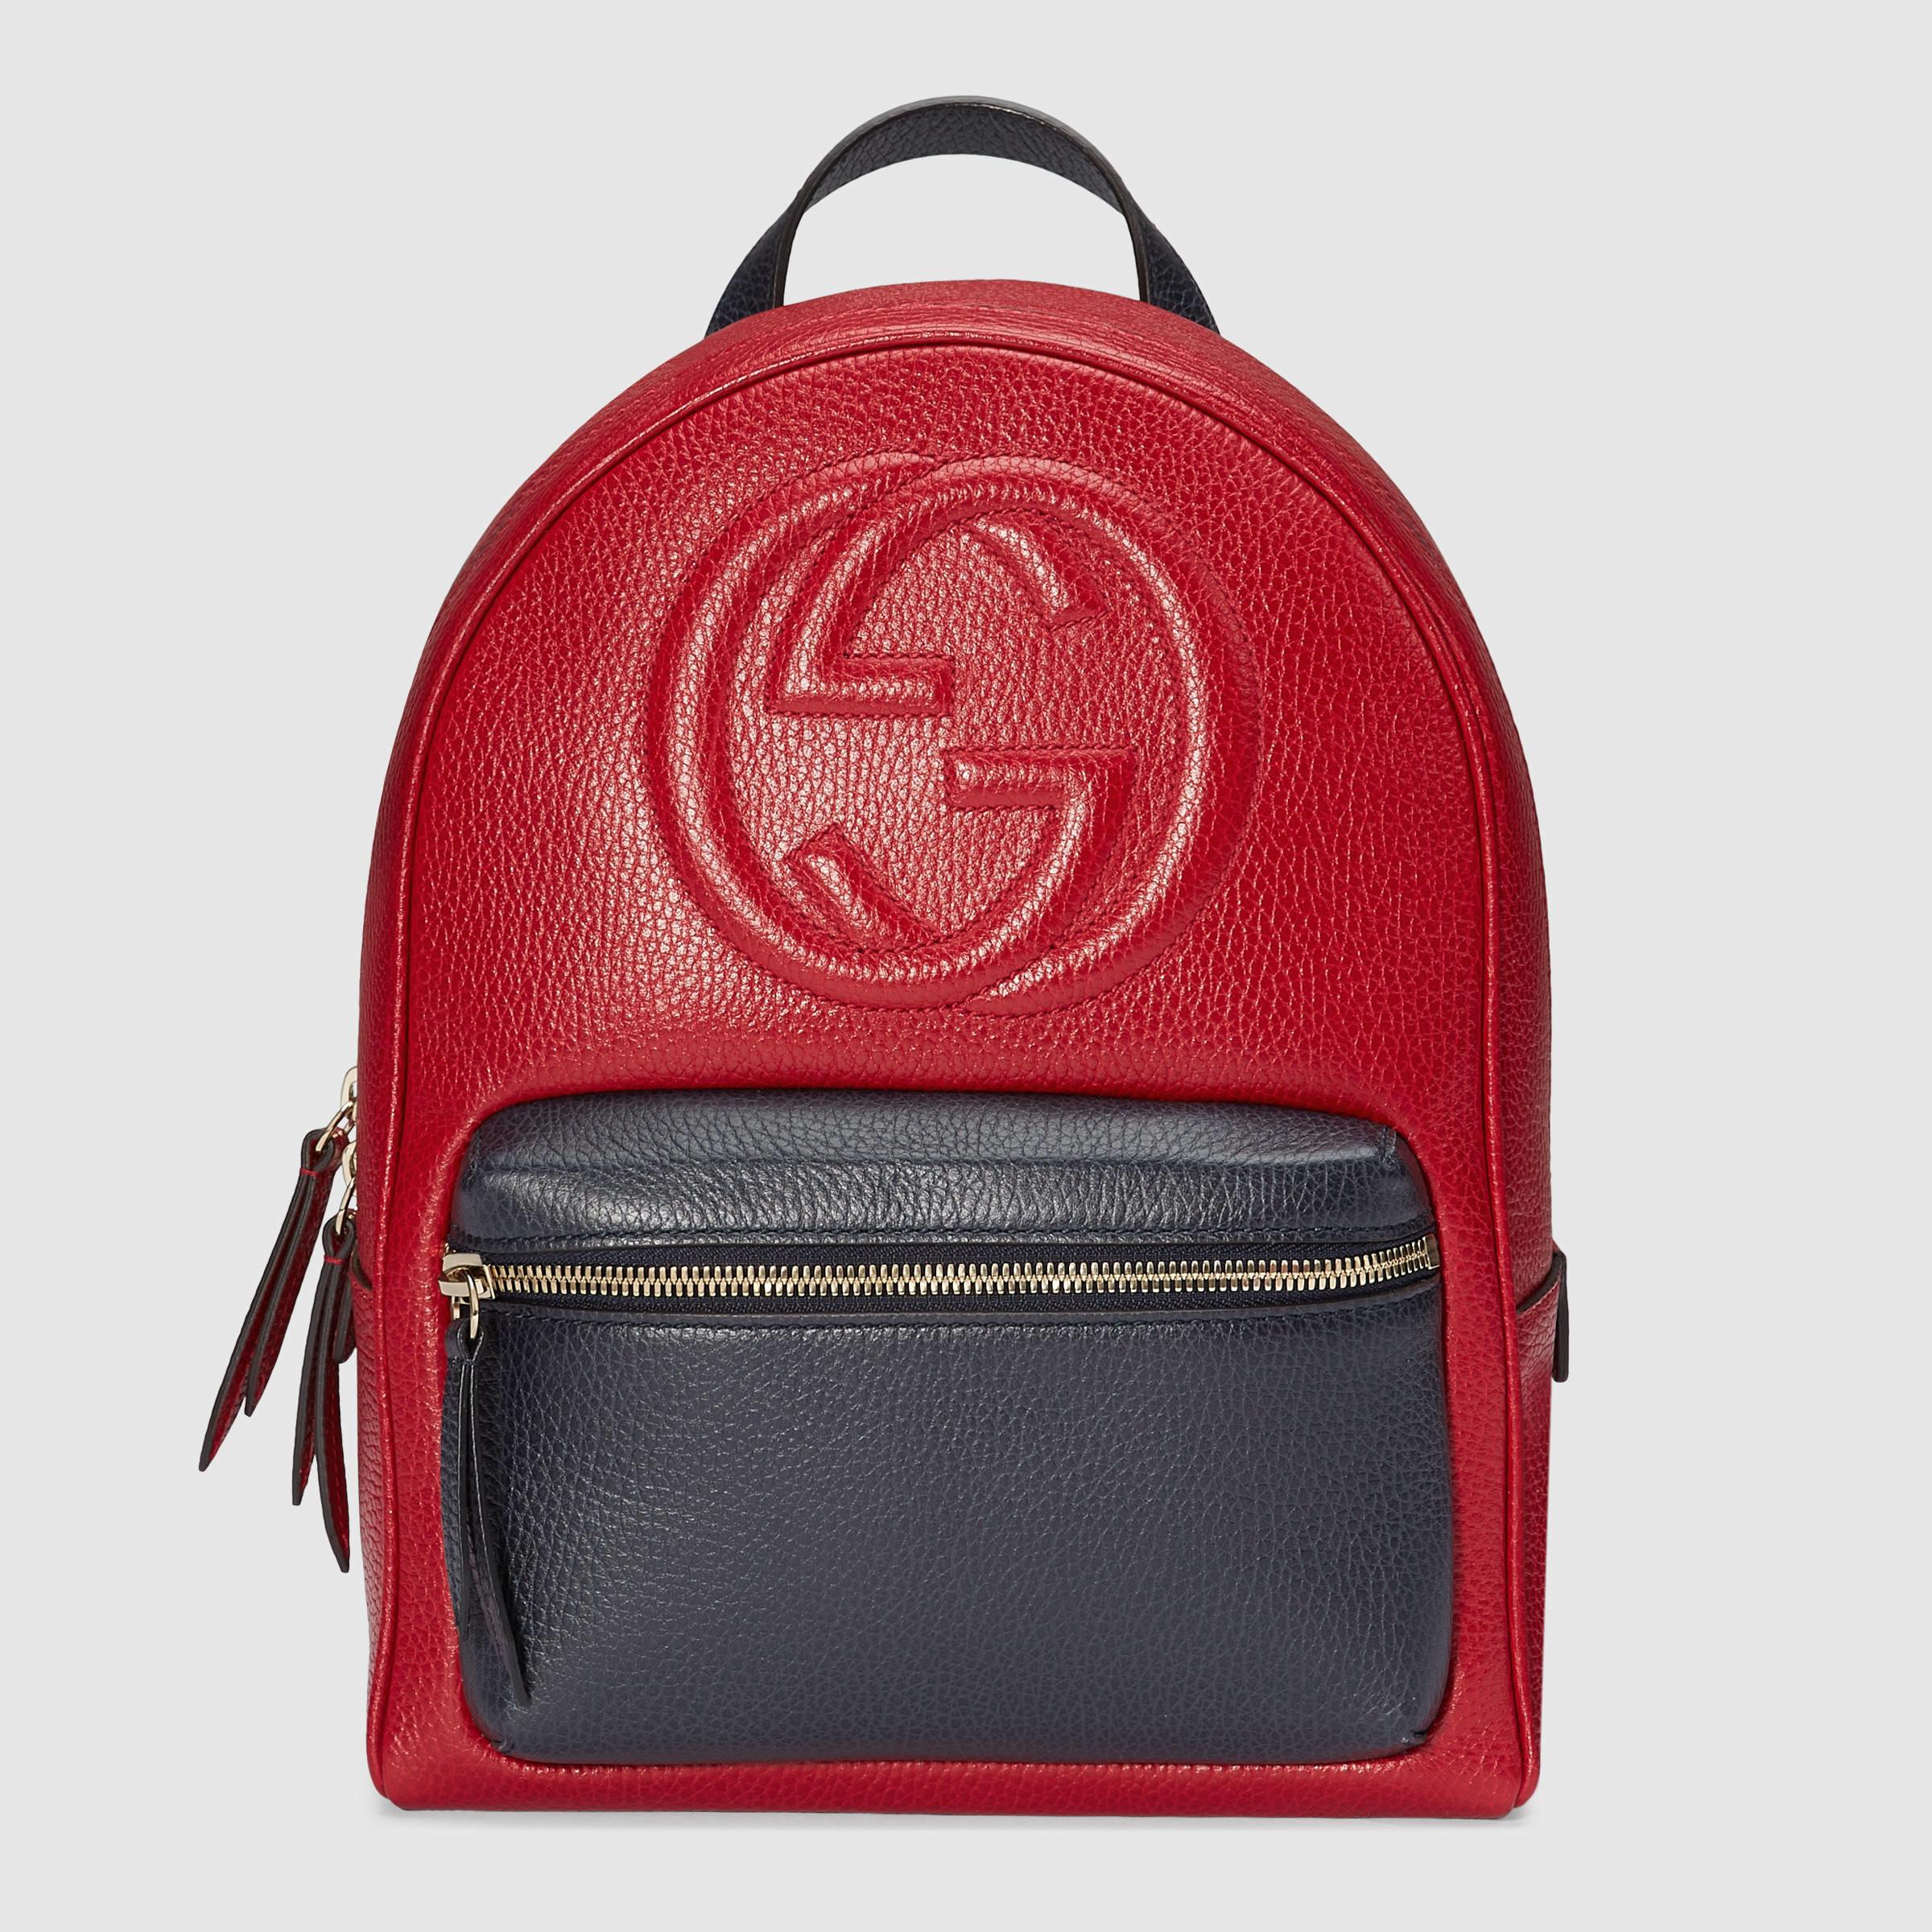 8f2137eba8fa Black Green Red Gucci Backpack- Fenix Toulouse Handball